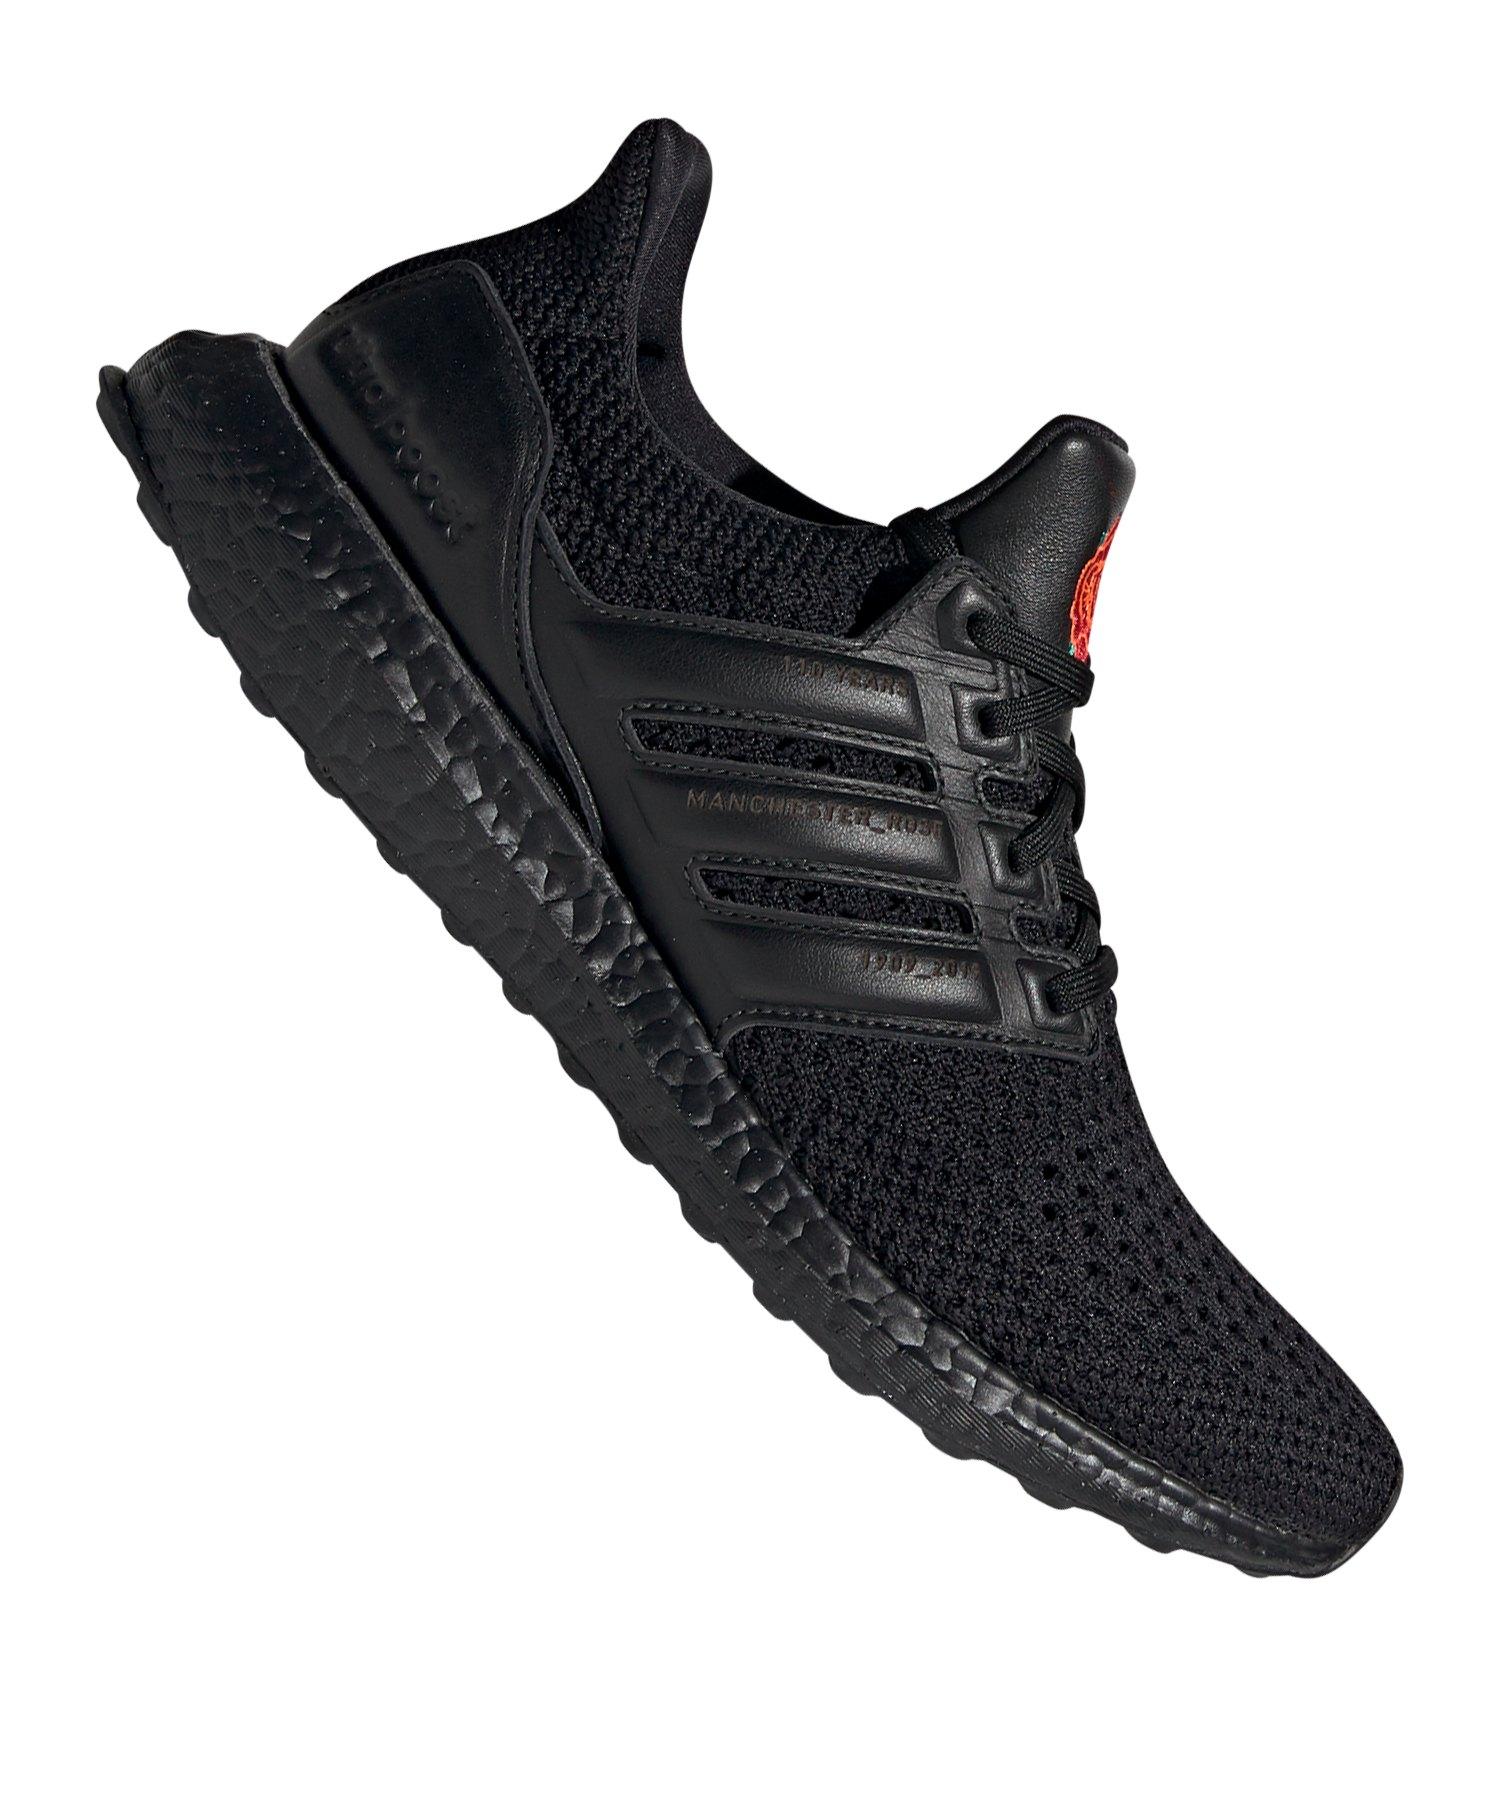 X Fc Schwarz Rot Ultra Boost Mu Adidas Running LMSpjqUVGz